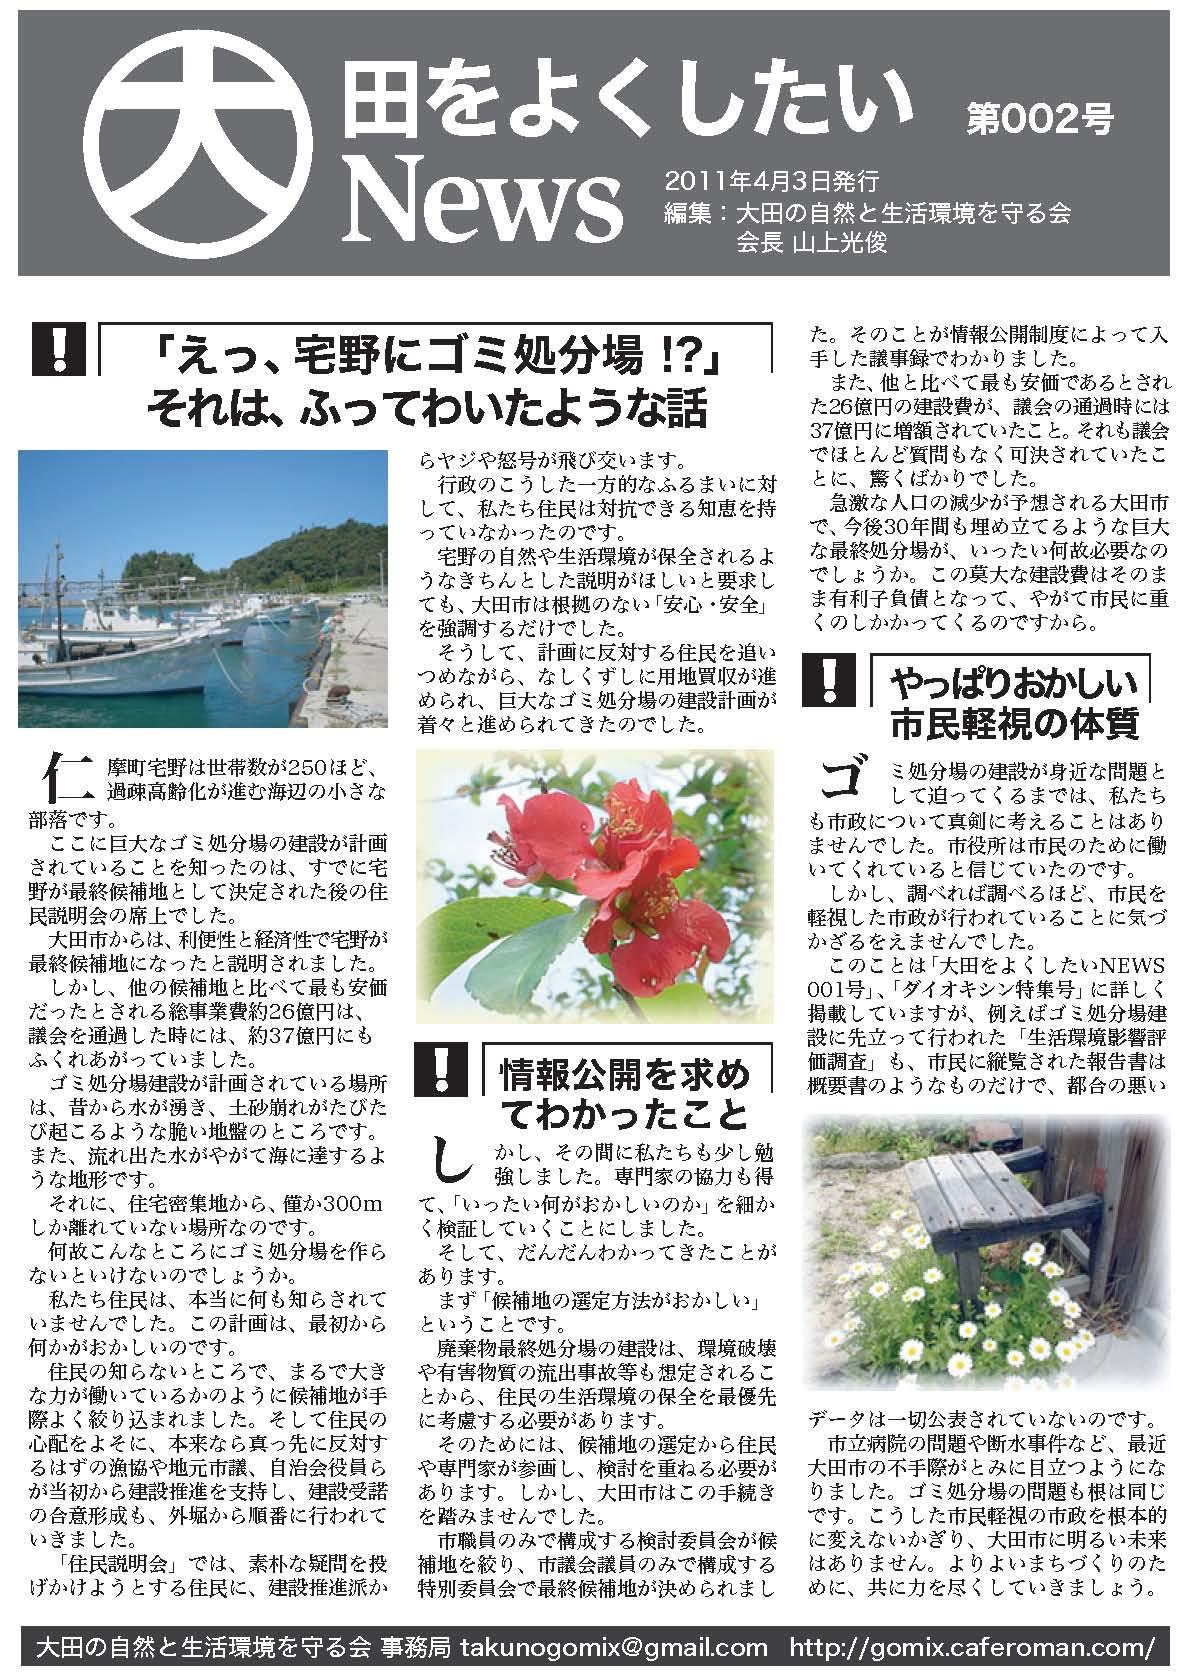 yokusuru_News_web_002.jpg